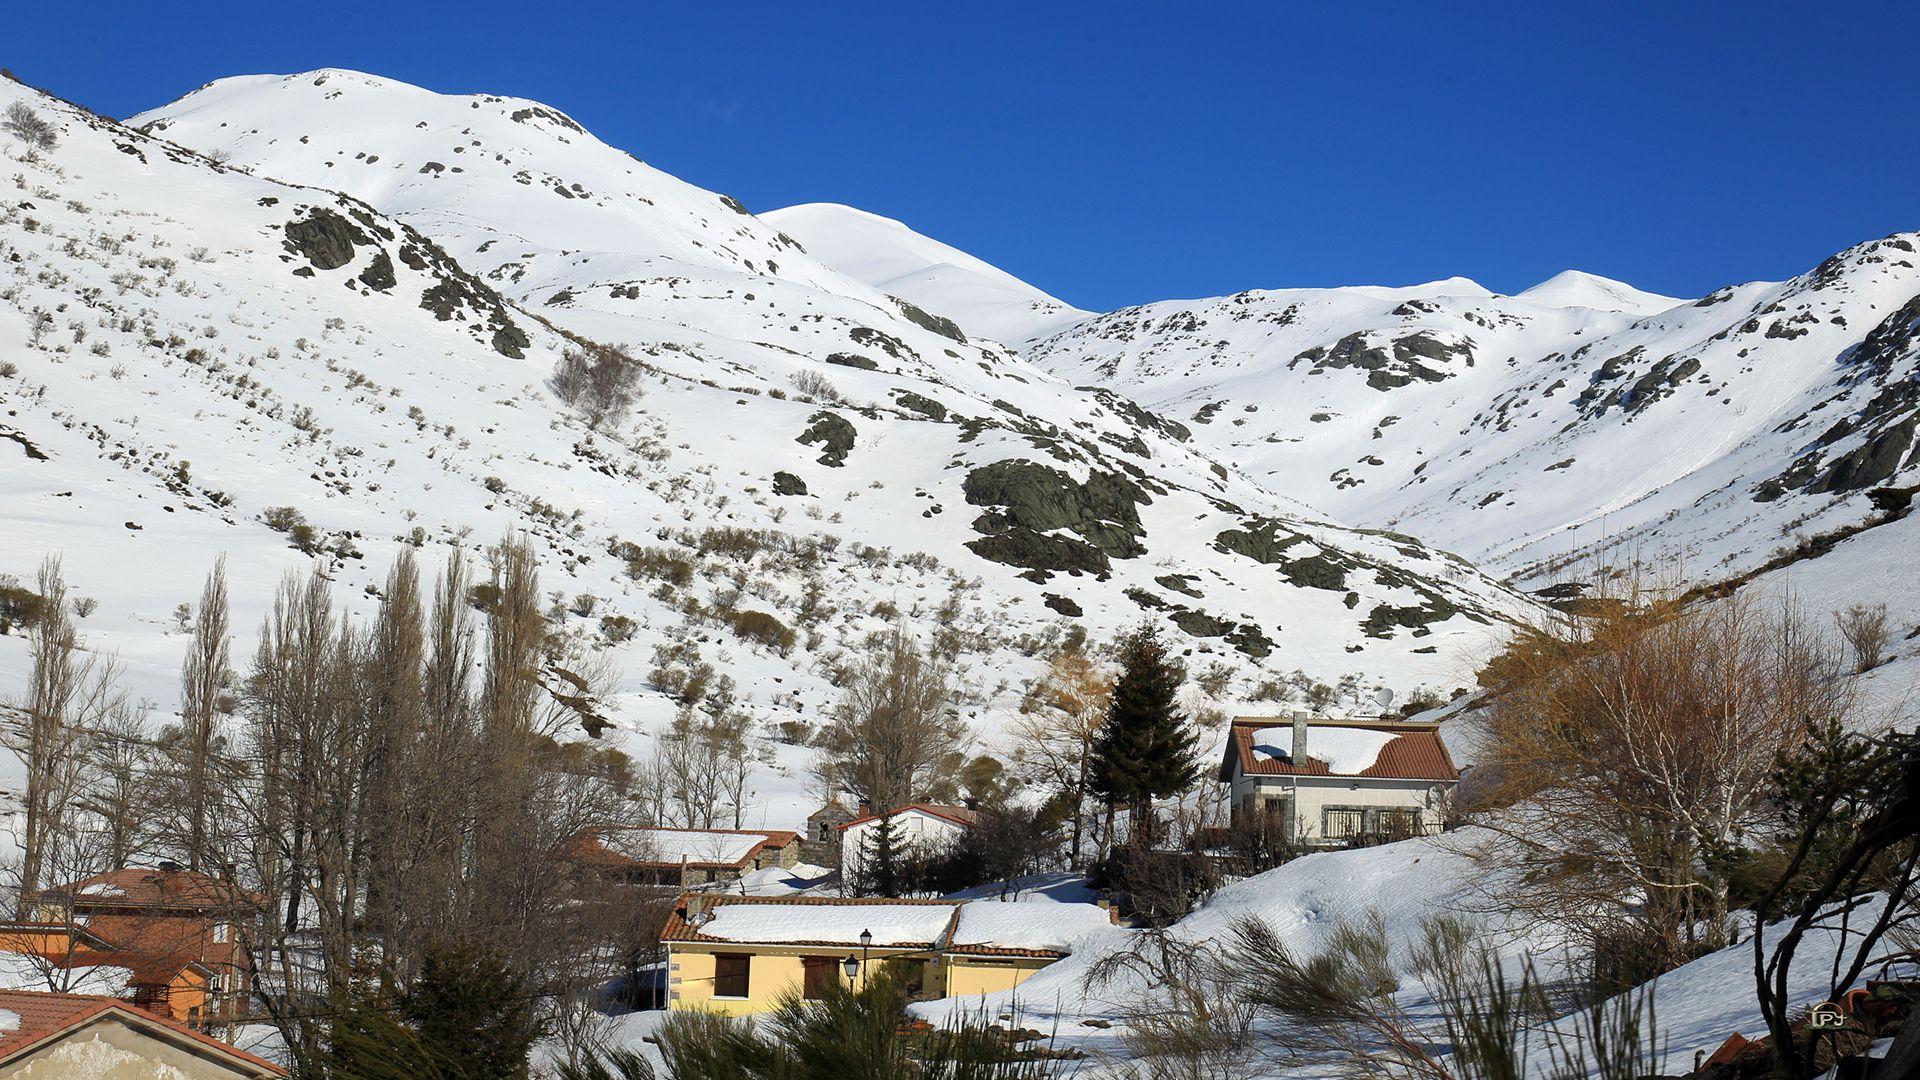 Cardaño De Abajo Montaña Palentina Spain Parques Naturales San Salvador Montañas